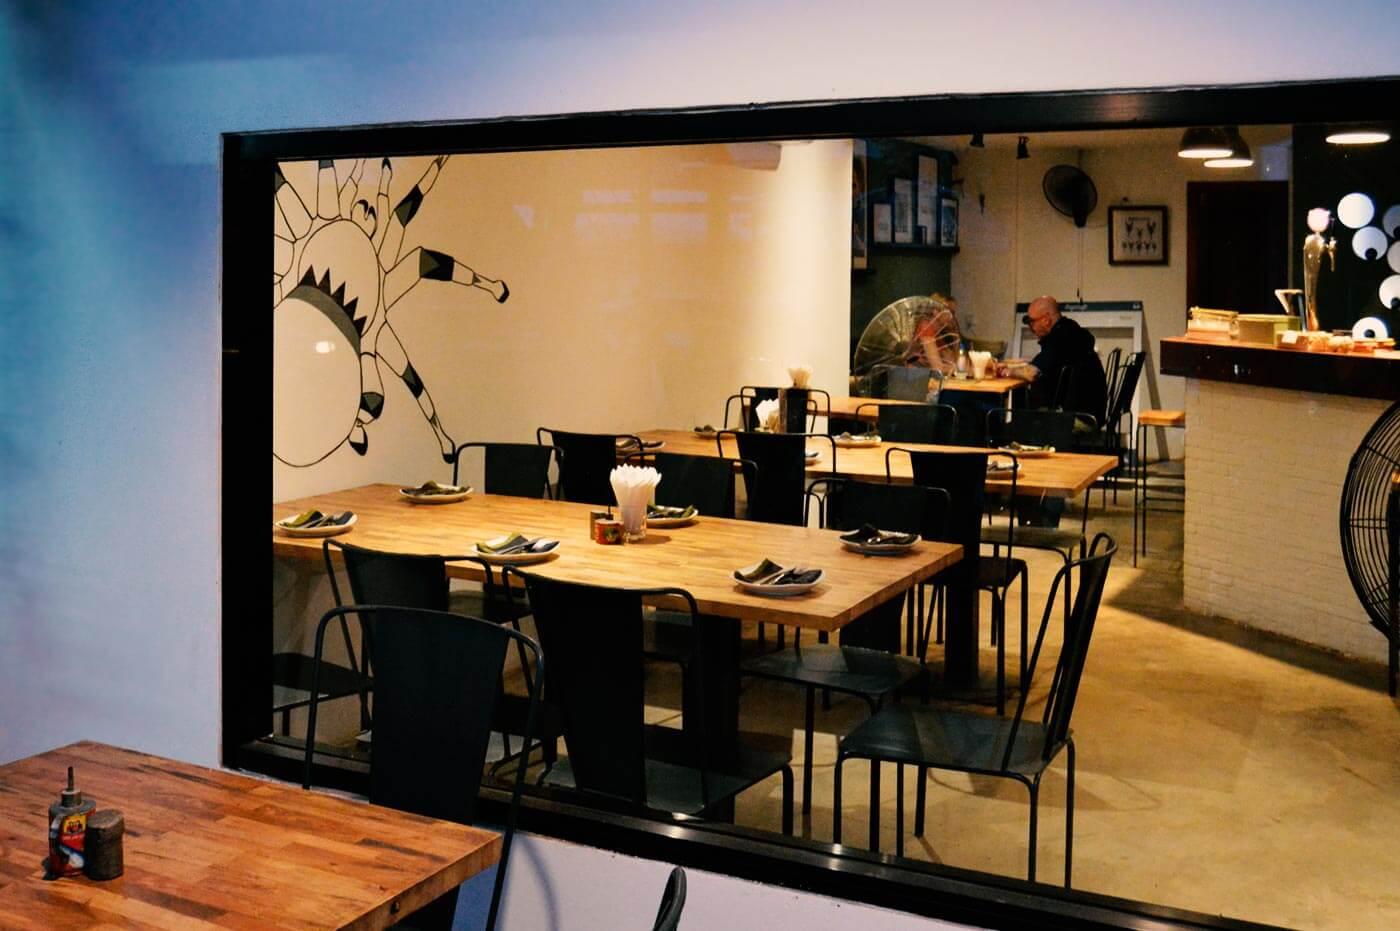 Fenster - Bugs Cafe, Siem Reap